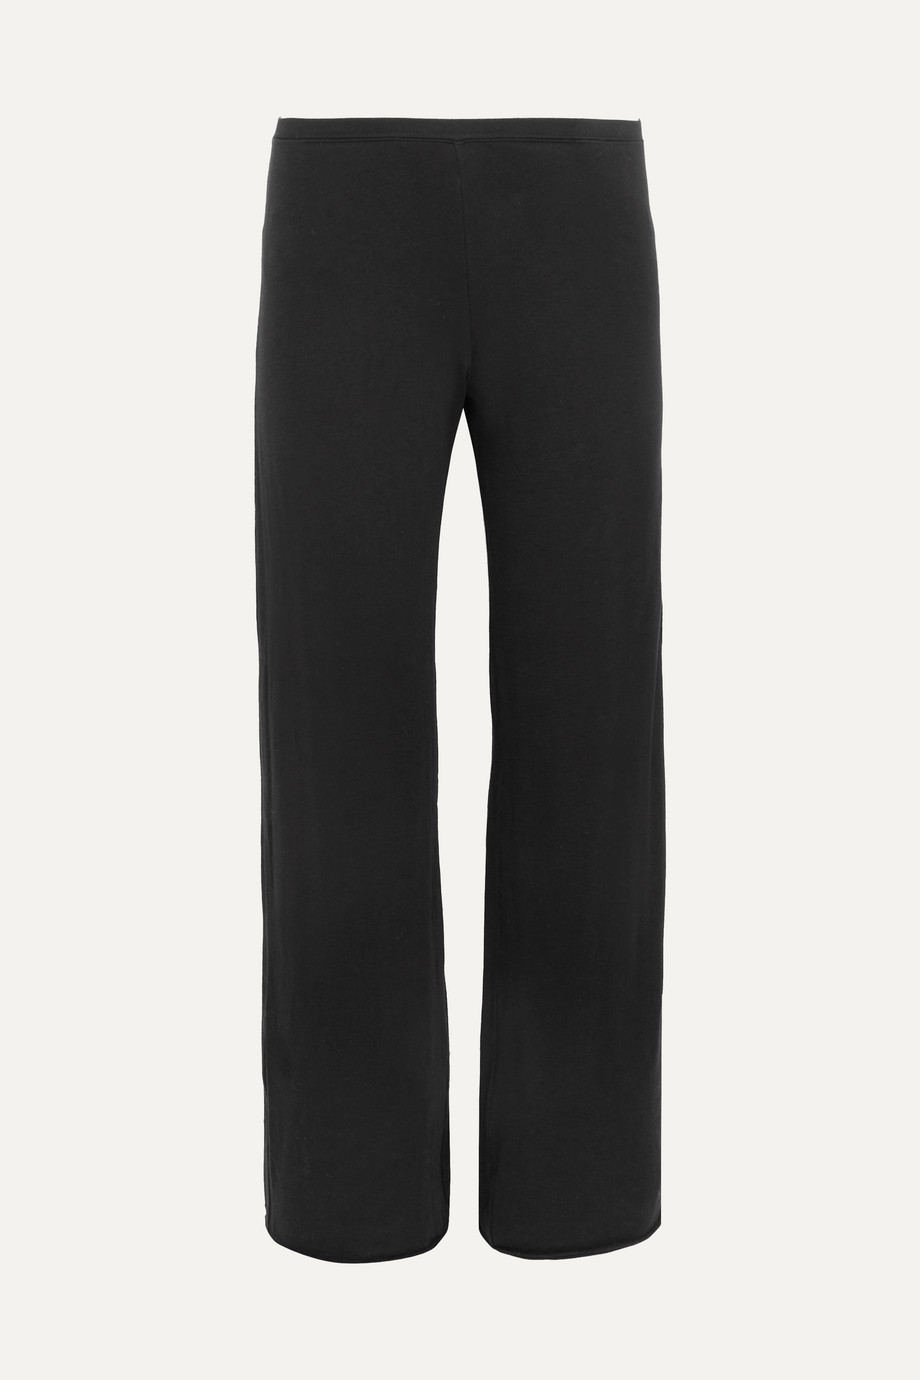 Skin Essentials Pyjama-Hose aus Pima-Baumwoll-Jersey